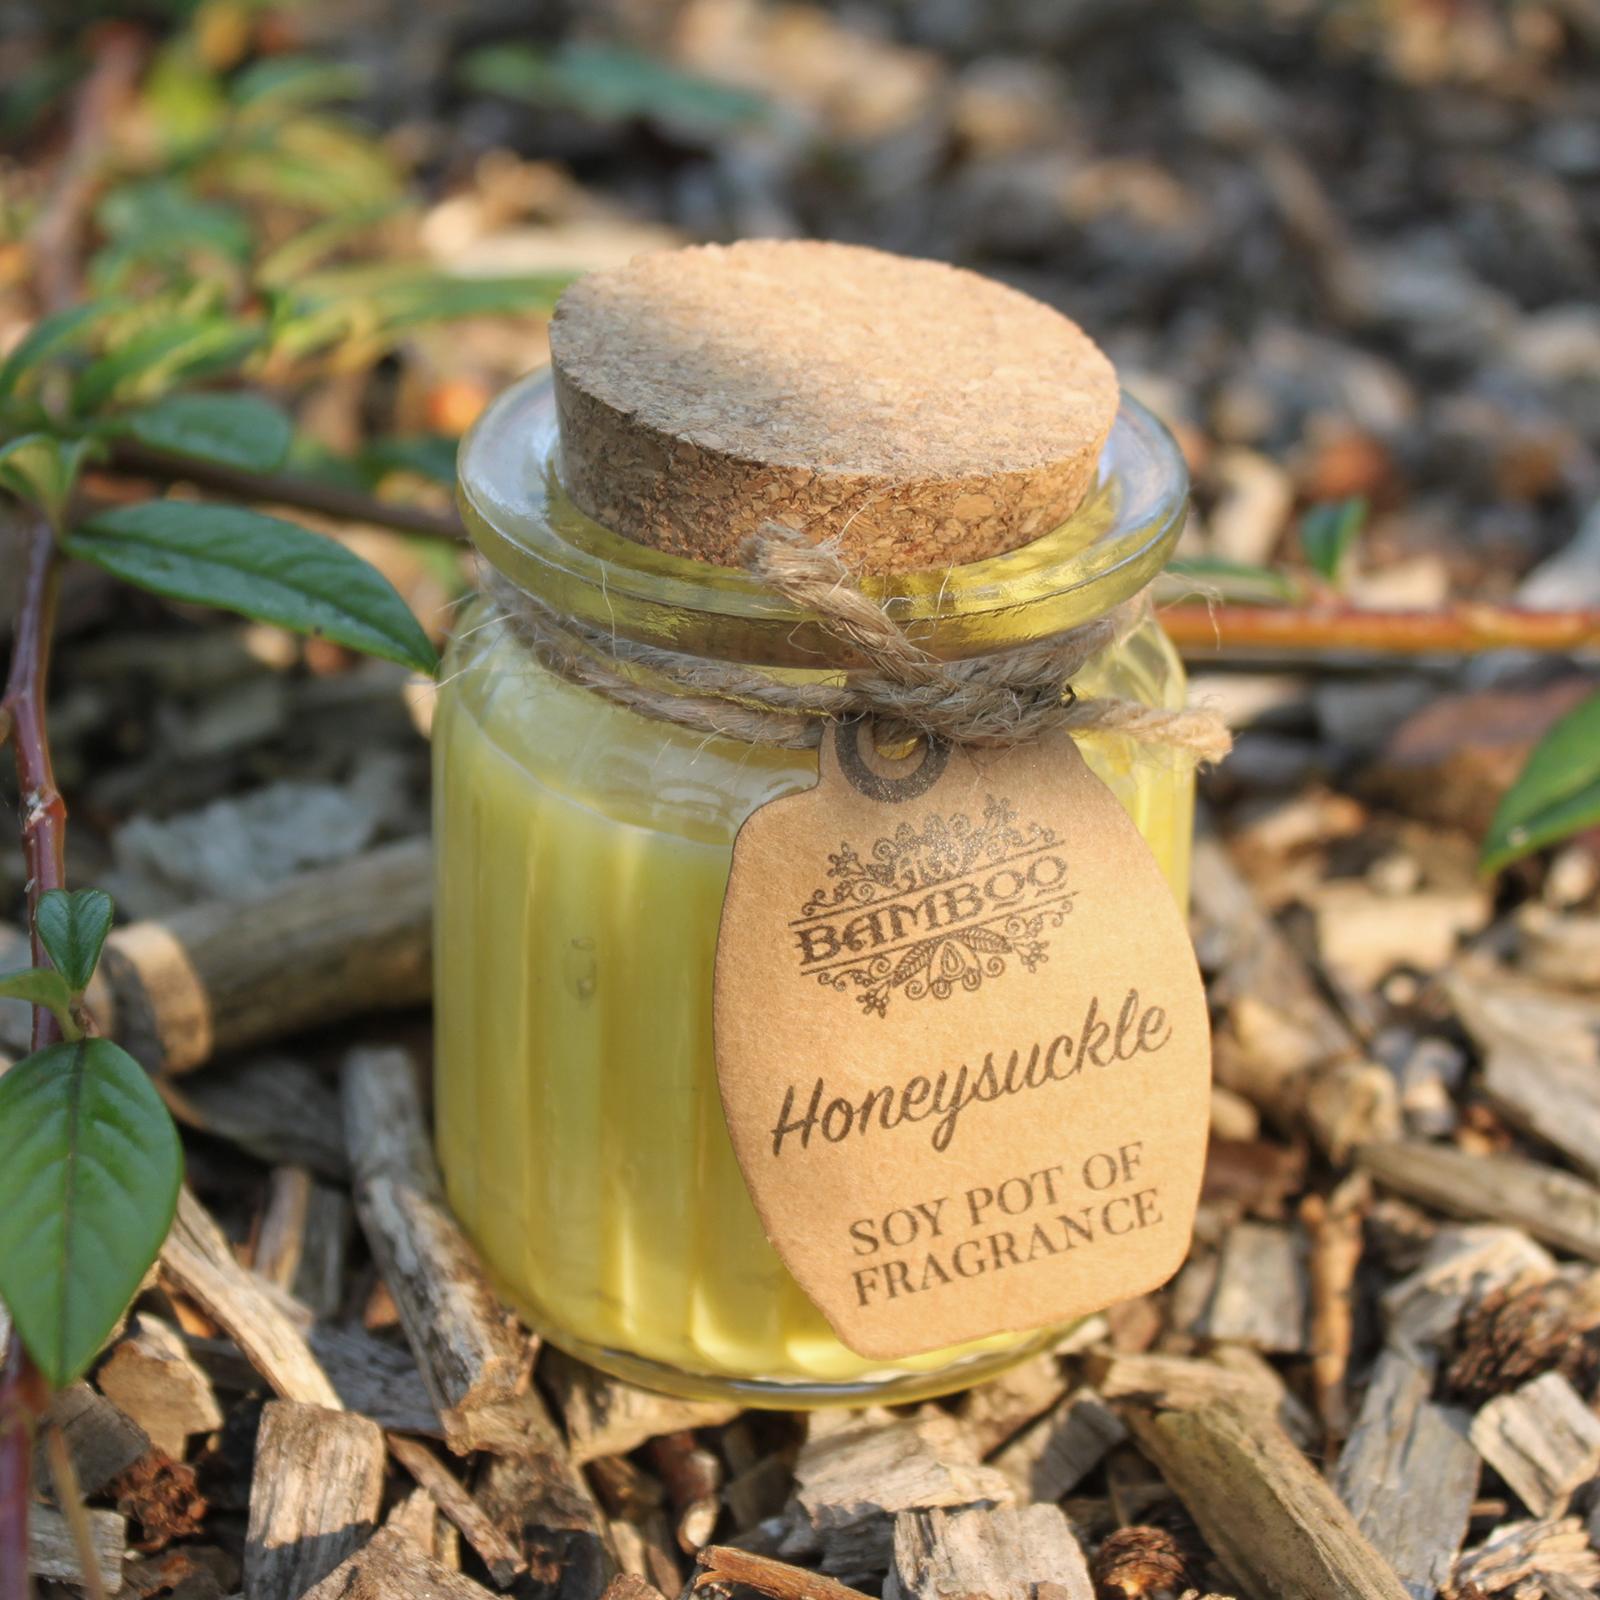 2x Honeysuckle Soy Pot of Fragrance Candles